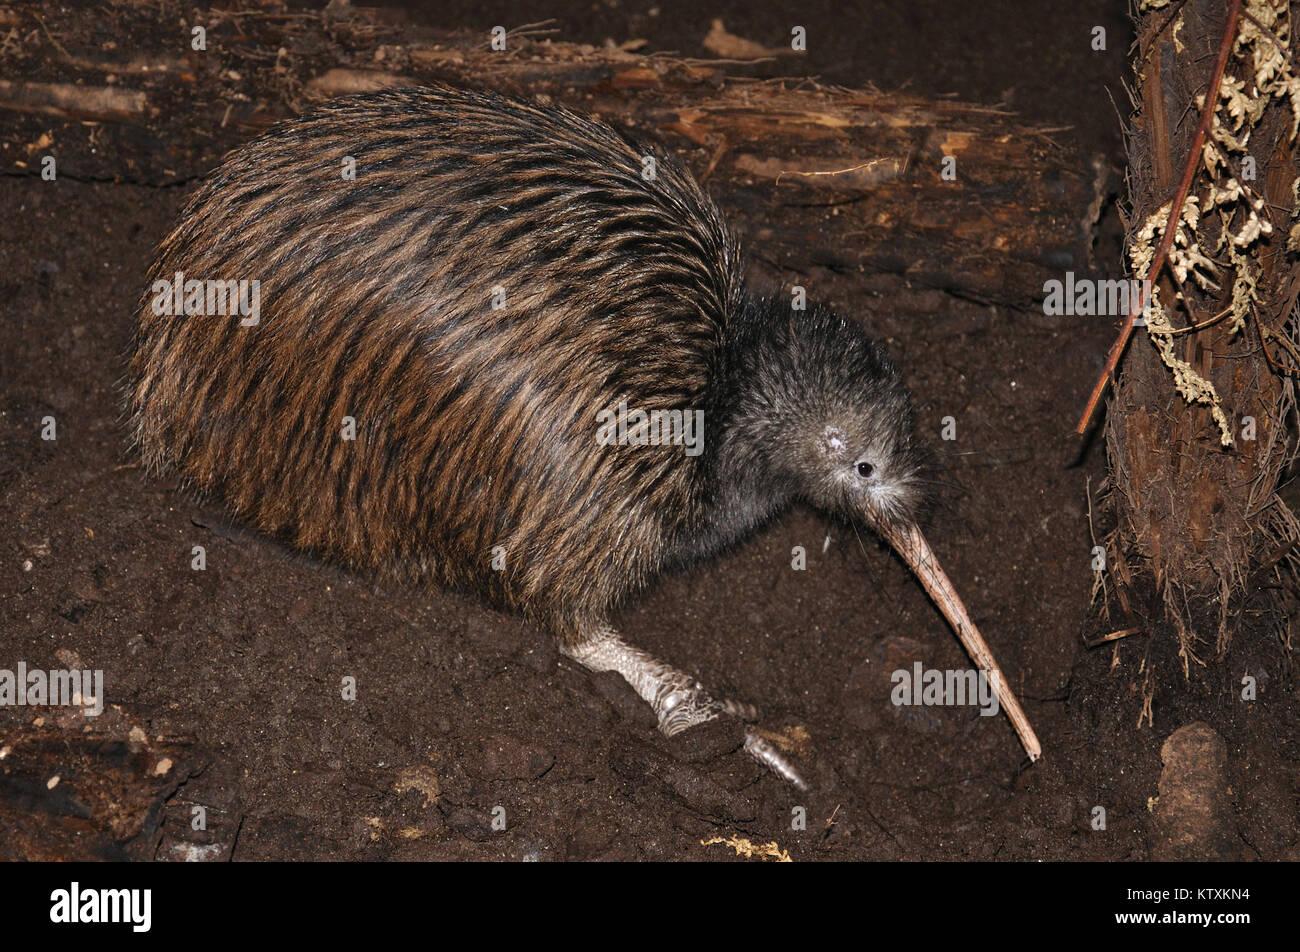 North Island brown kiwi, Apteryx australis, New Zealand - Stock Image